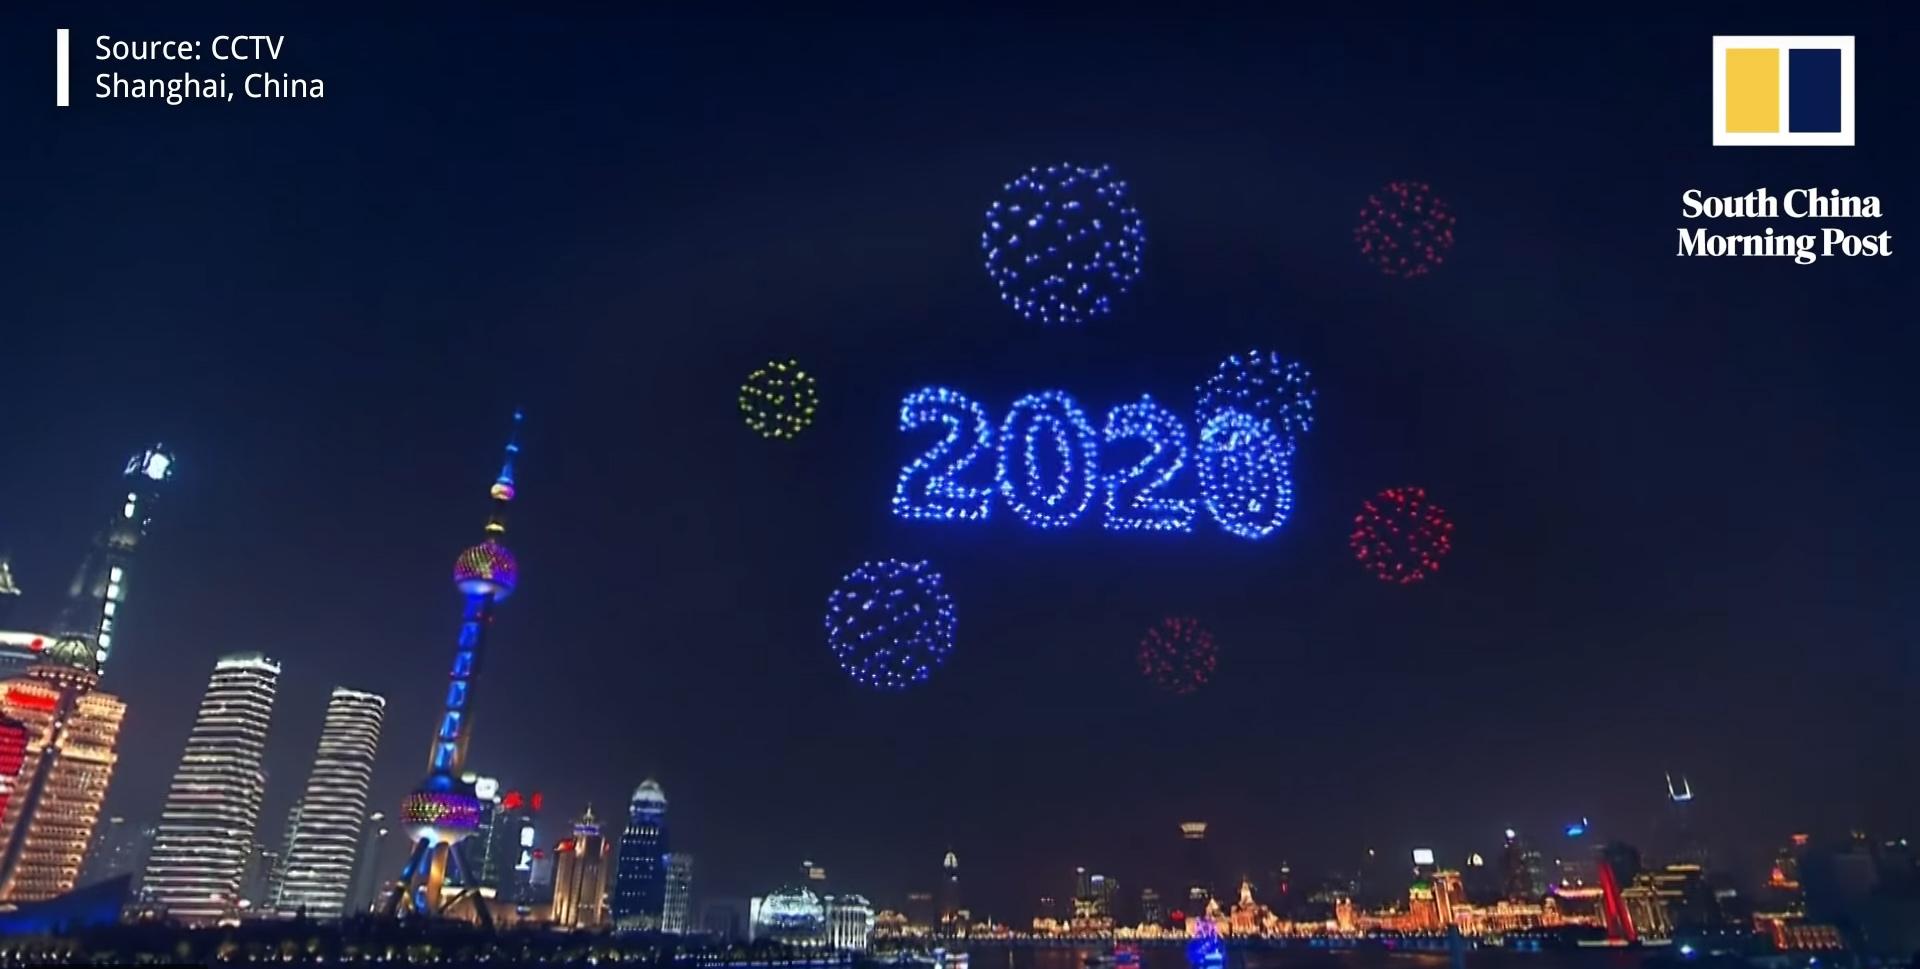 silvester 2020 drohnen show in shanhgai